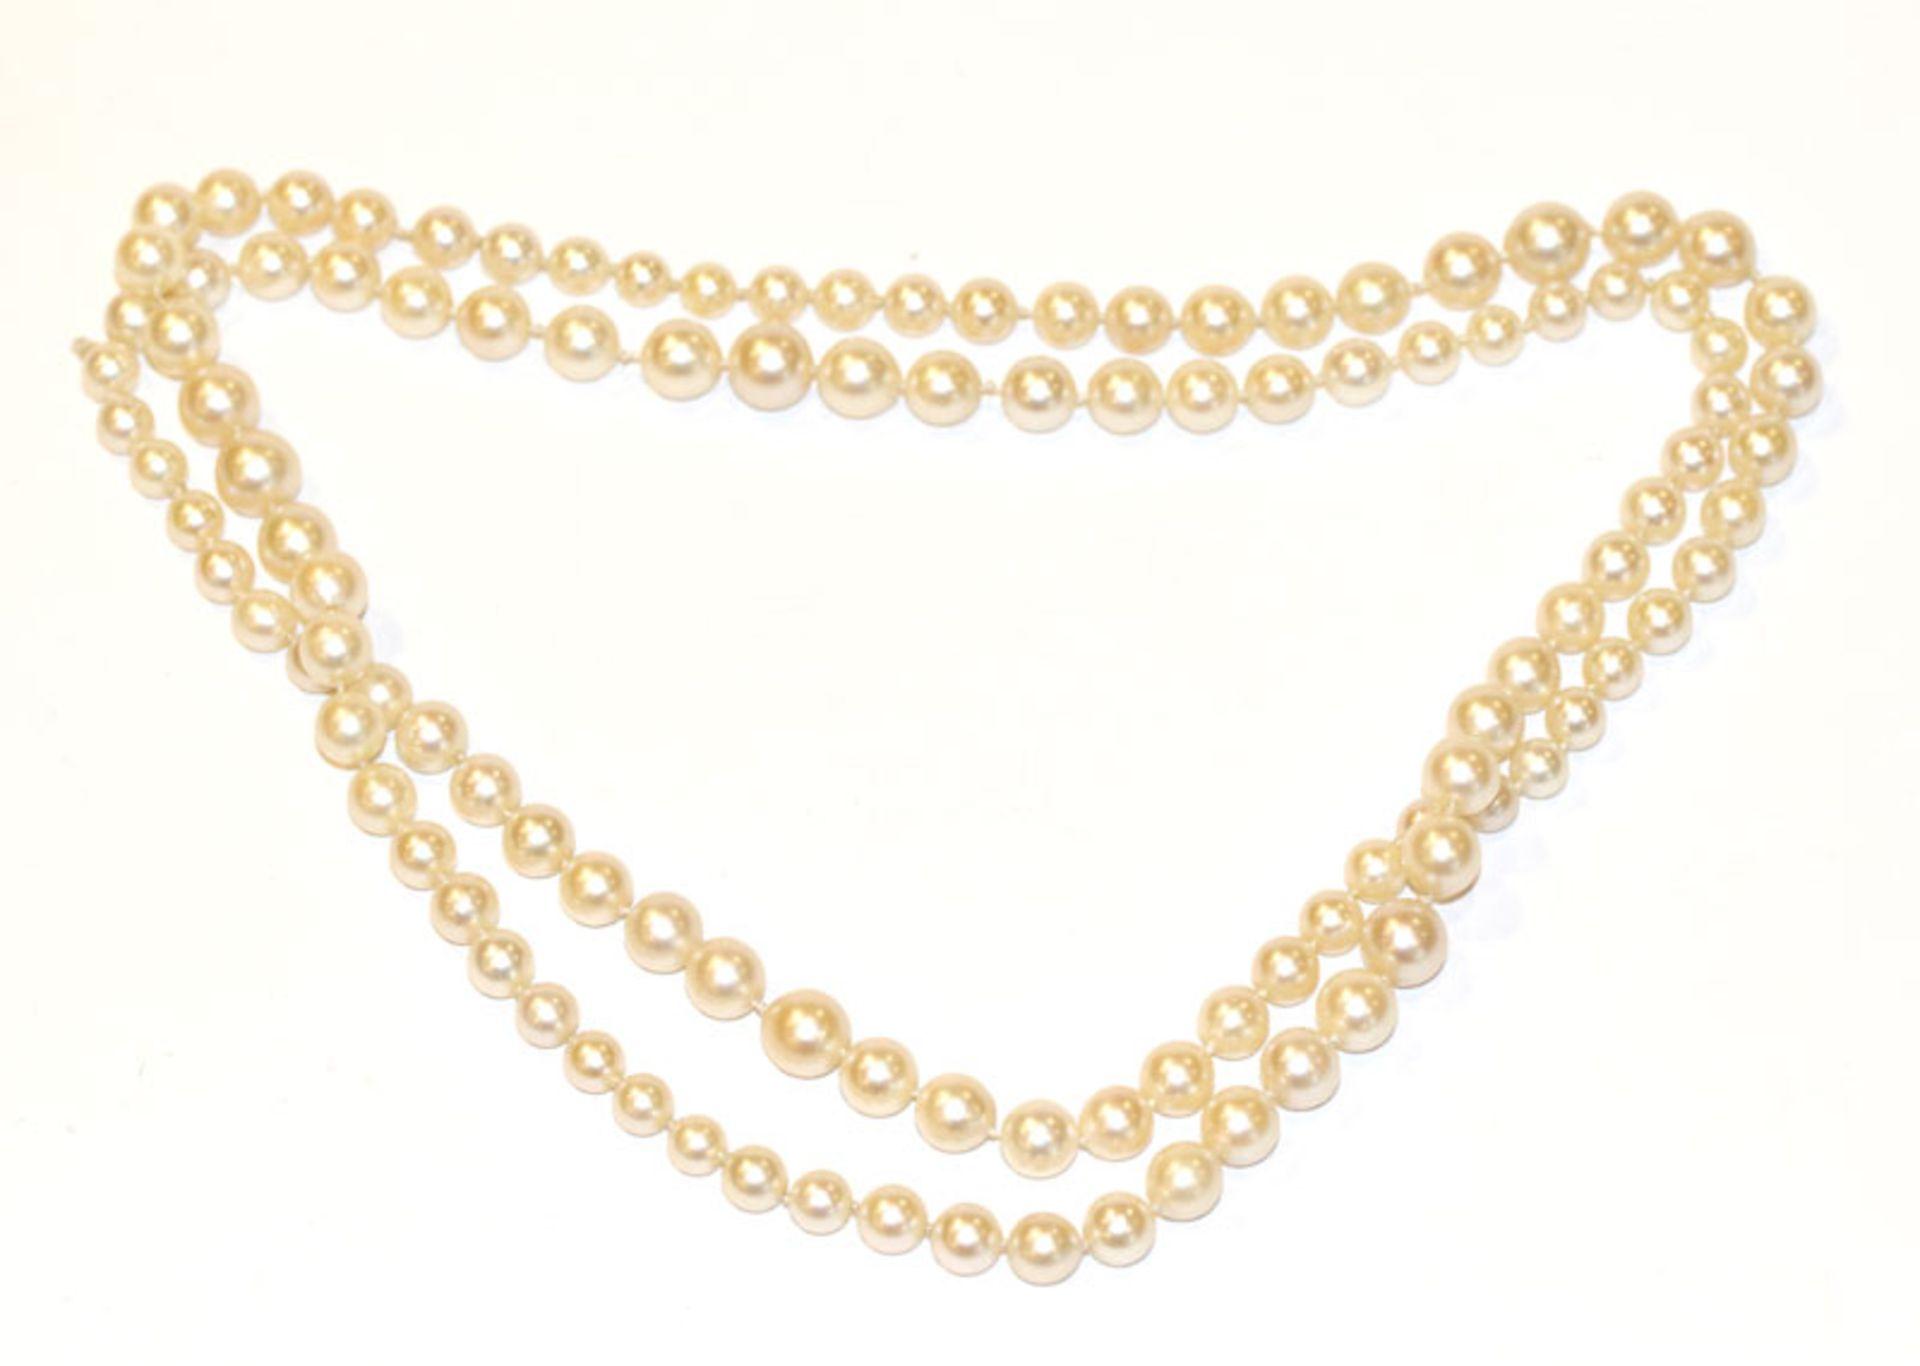 Endlos Perlenkette, Verlaufform, L 92 cm